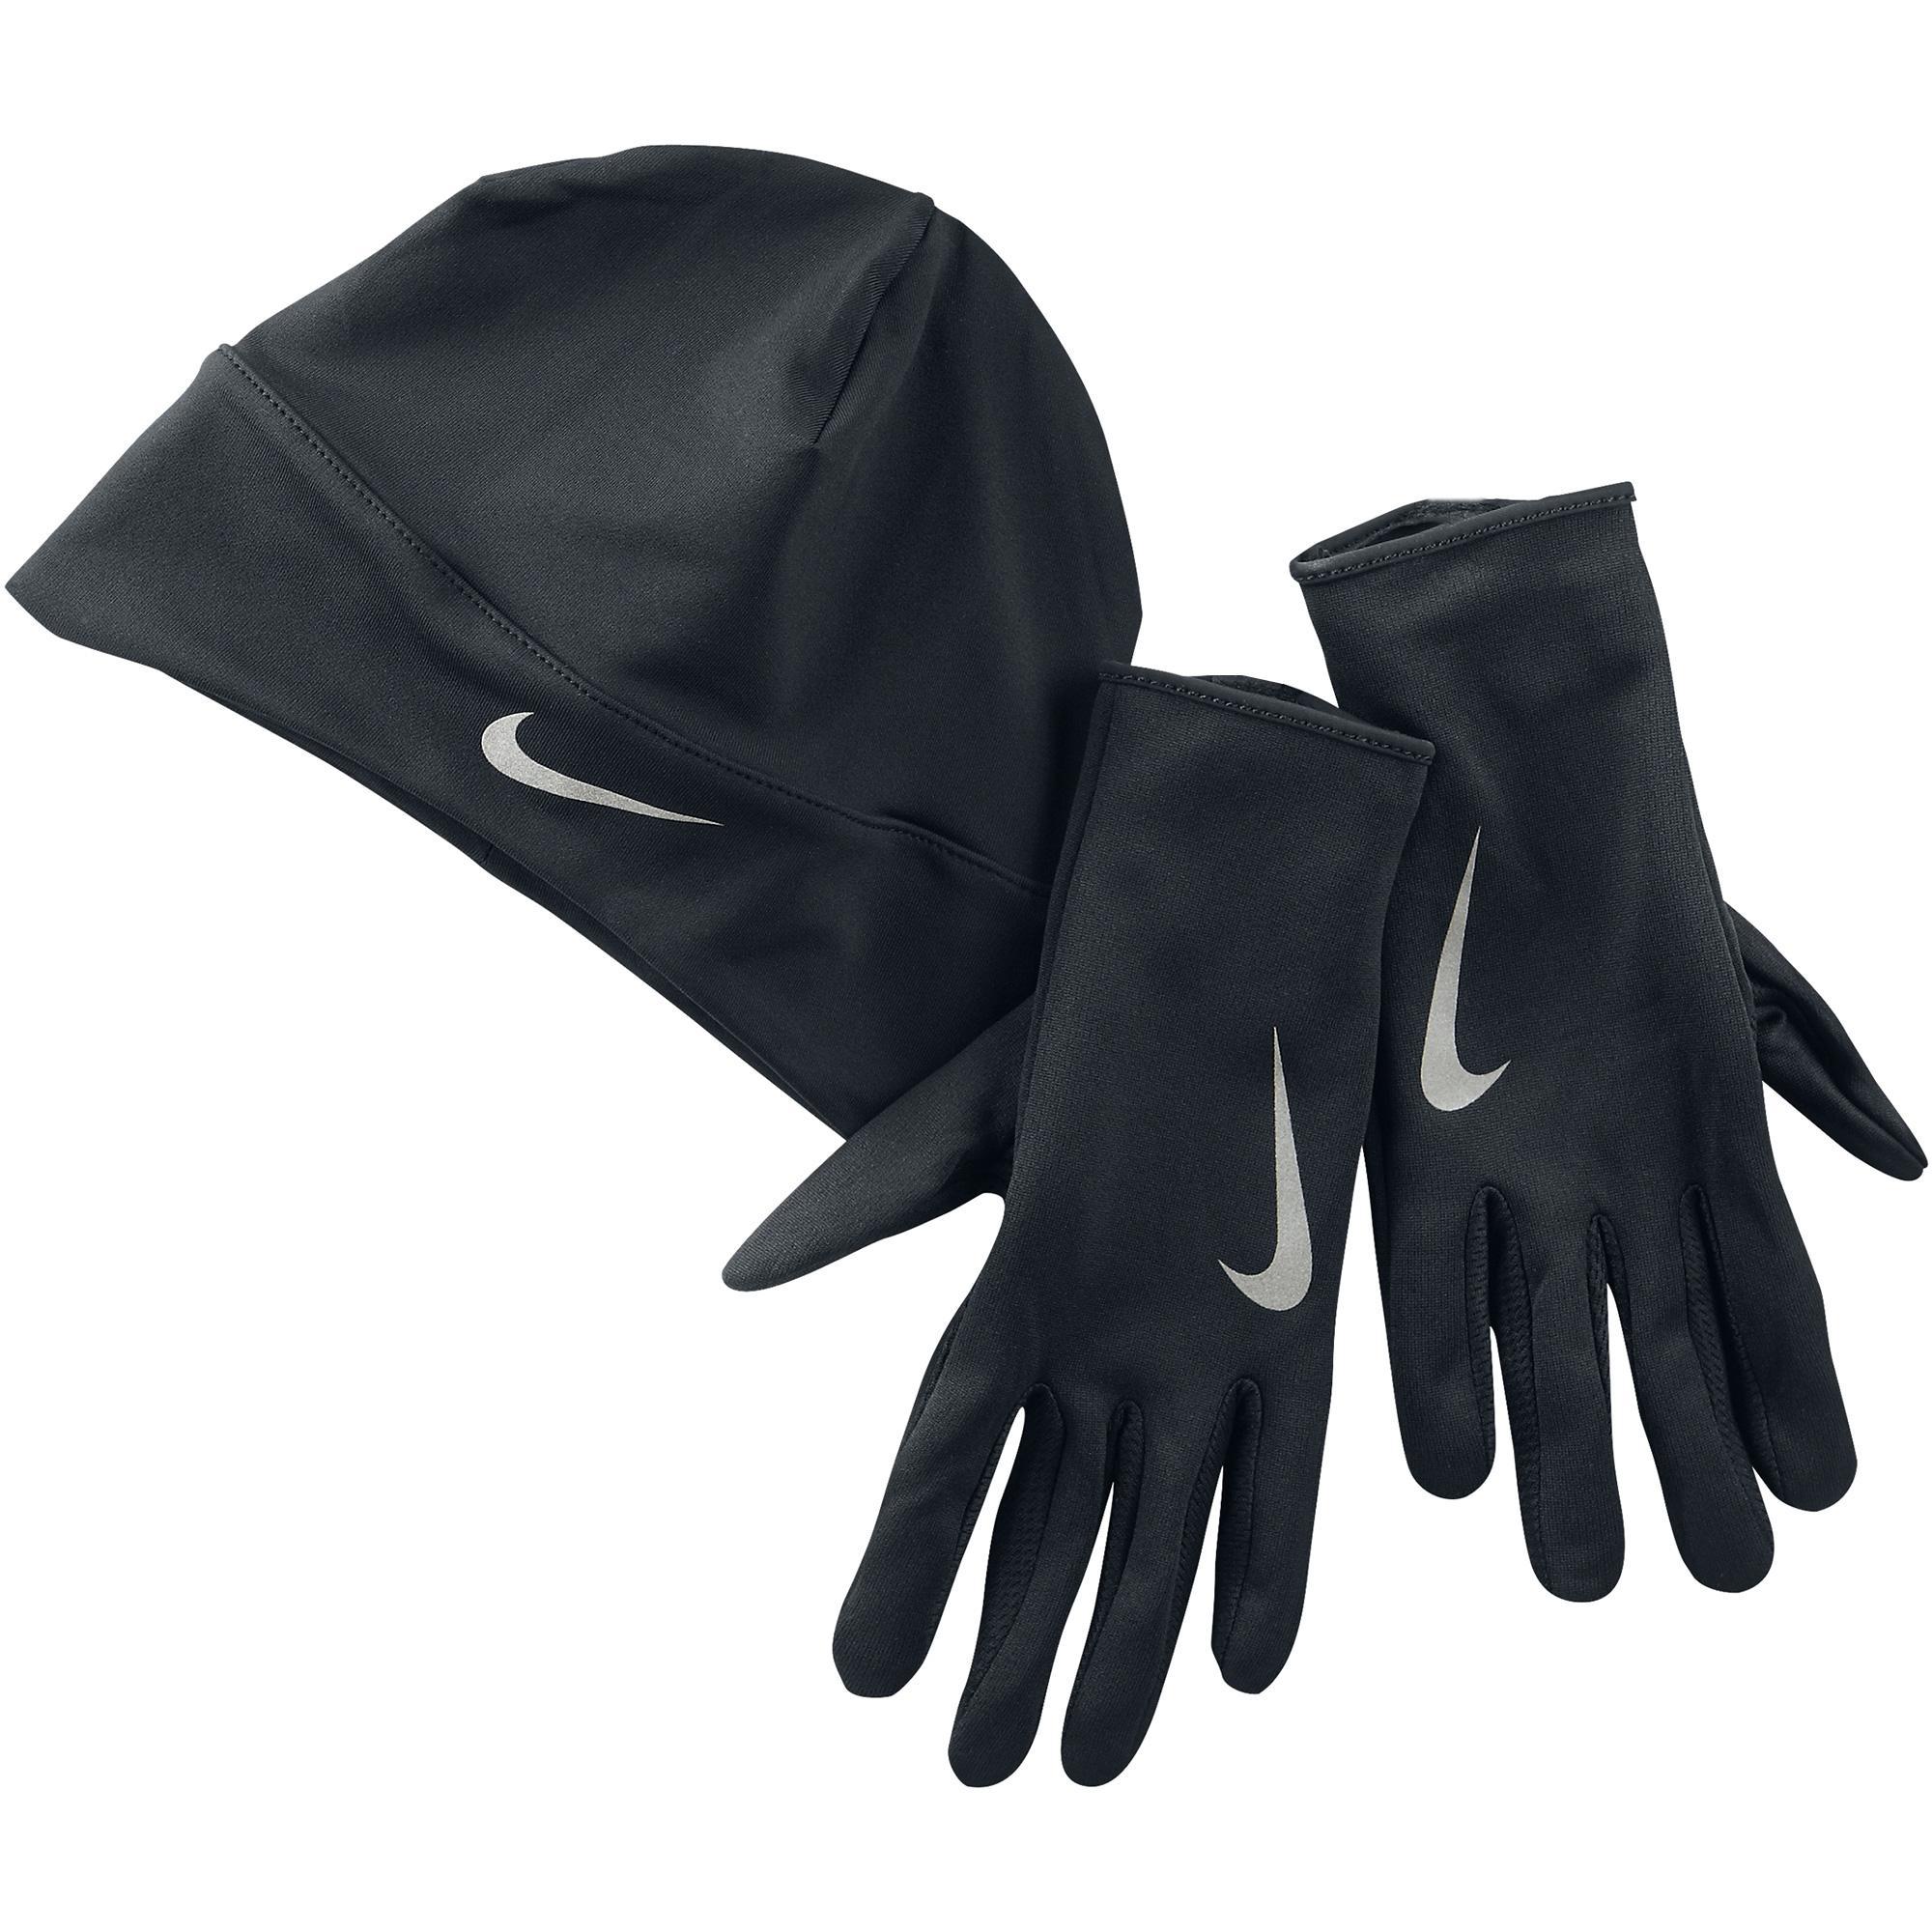 Nike Womens Dri-FIT Glove   Beanie Set - Black Silver - Tennisnuts.com a032839ca2b